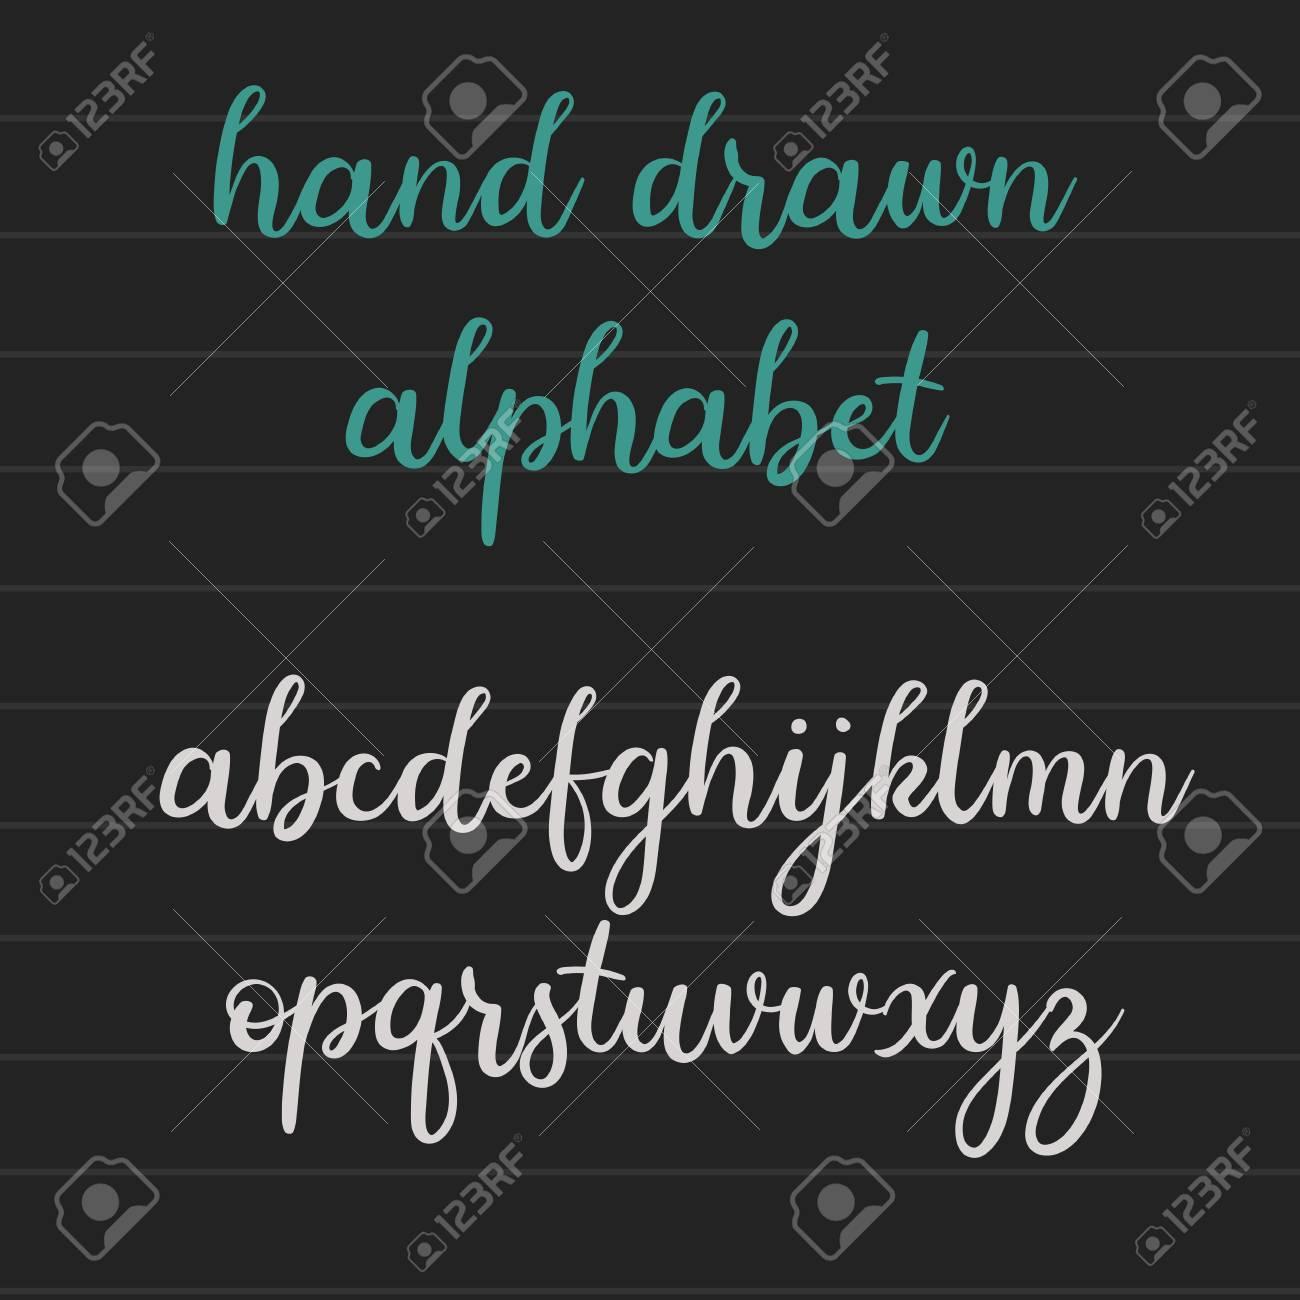 Handwritten Brush Style Alphabet Modern Calligraphy Hand Lettering Vector Script Font